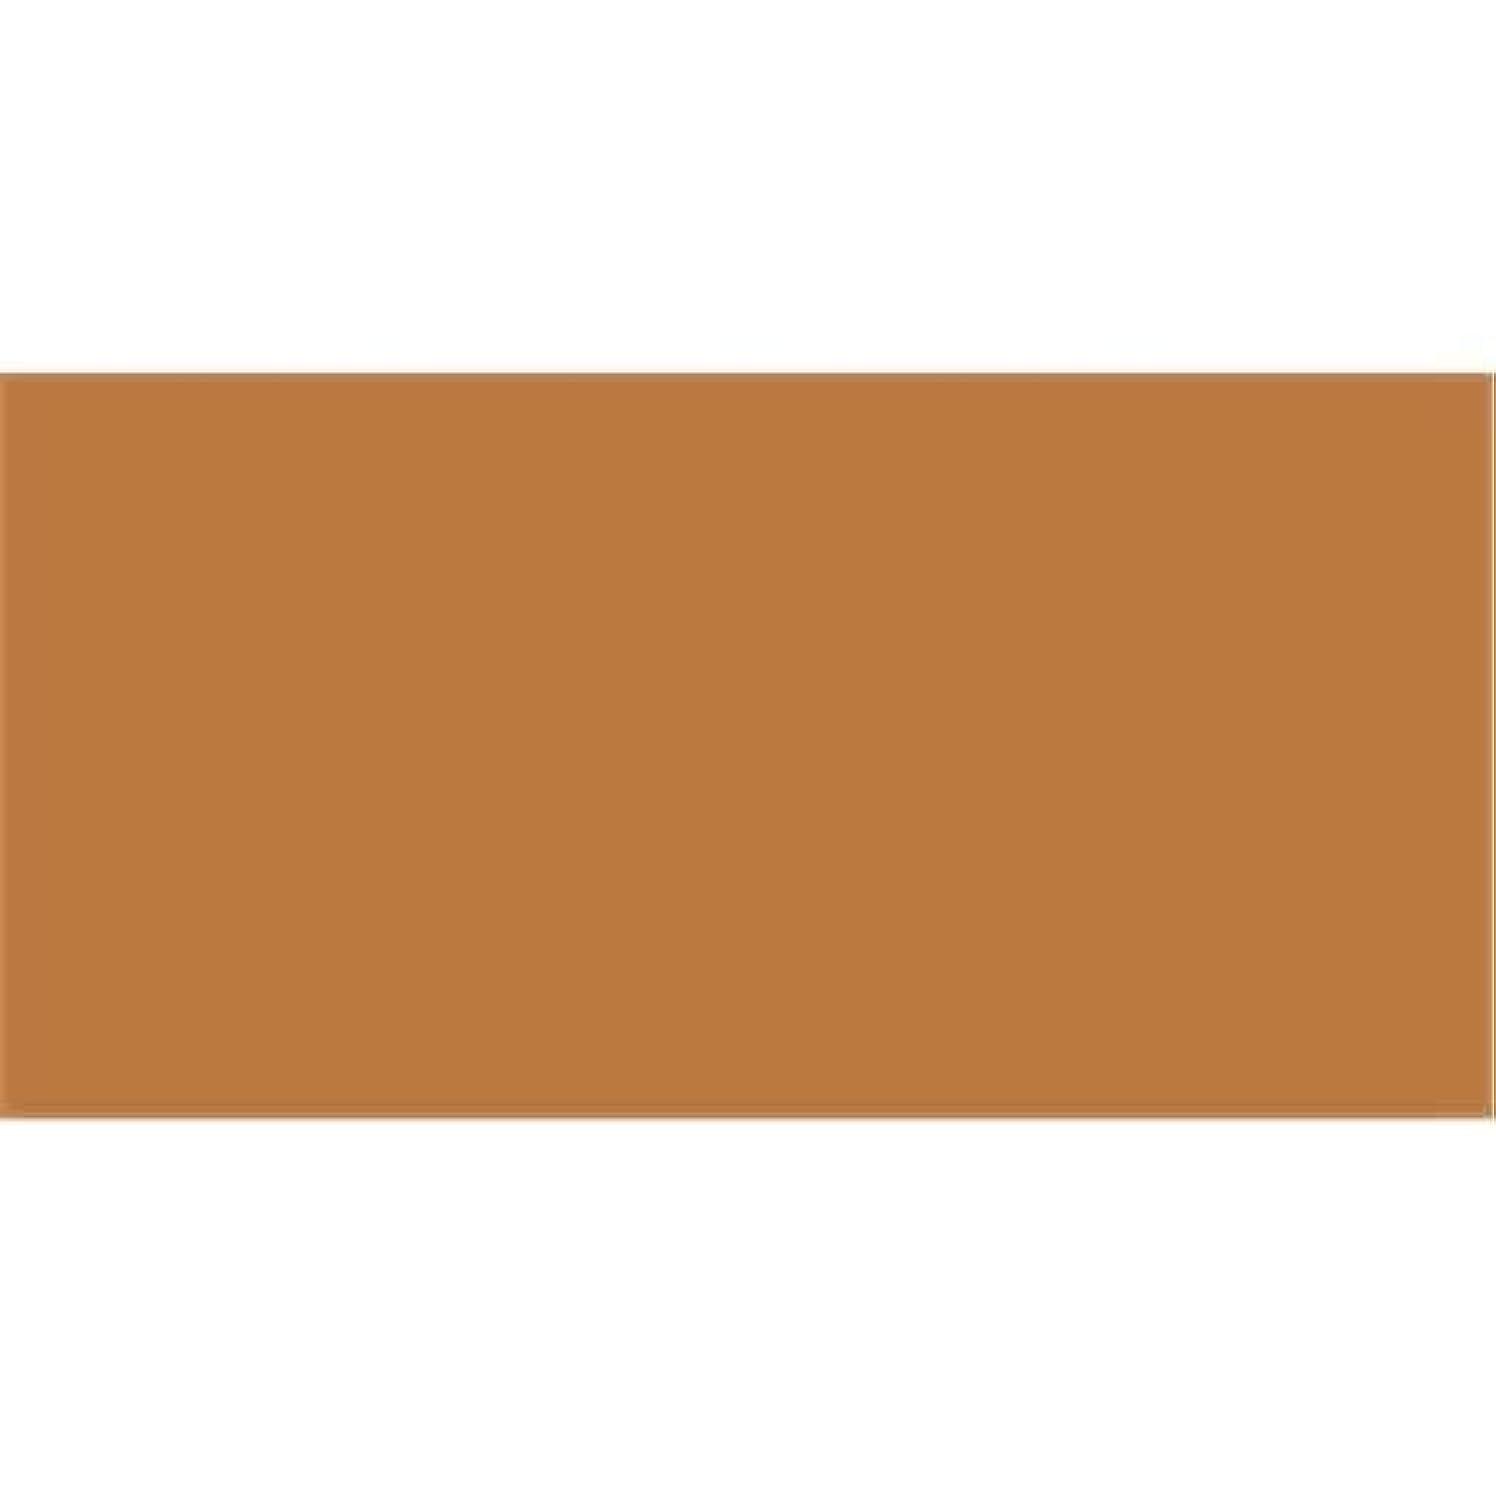 Zig Clean Color Real Brush Marker, Light Brown